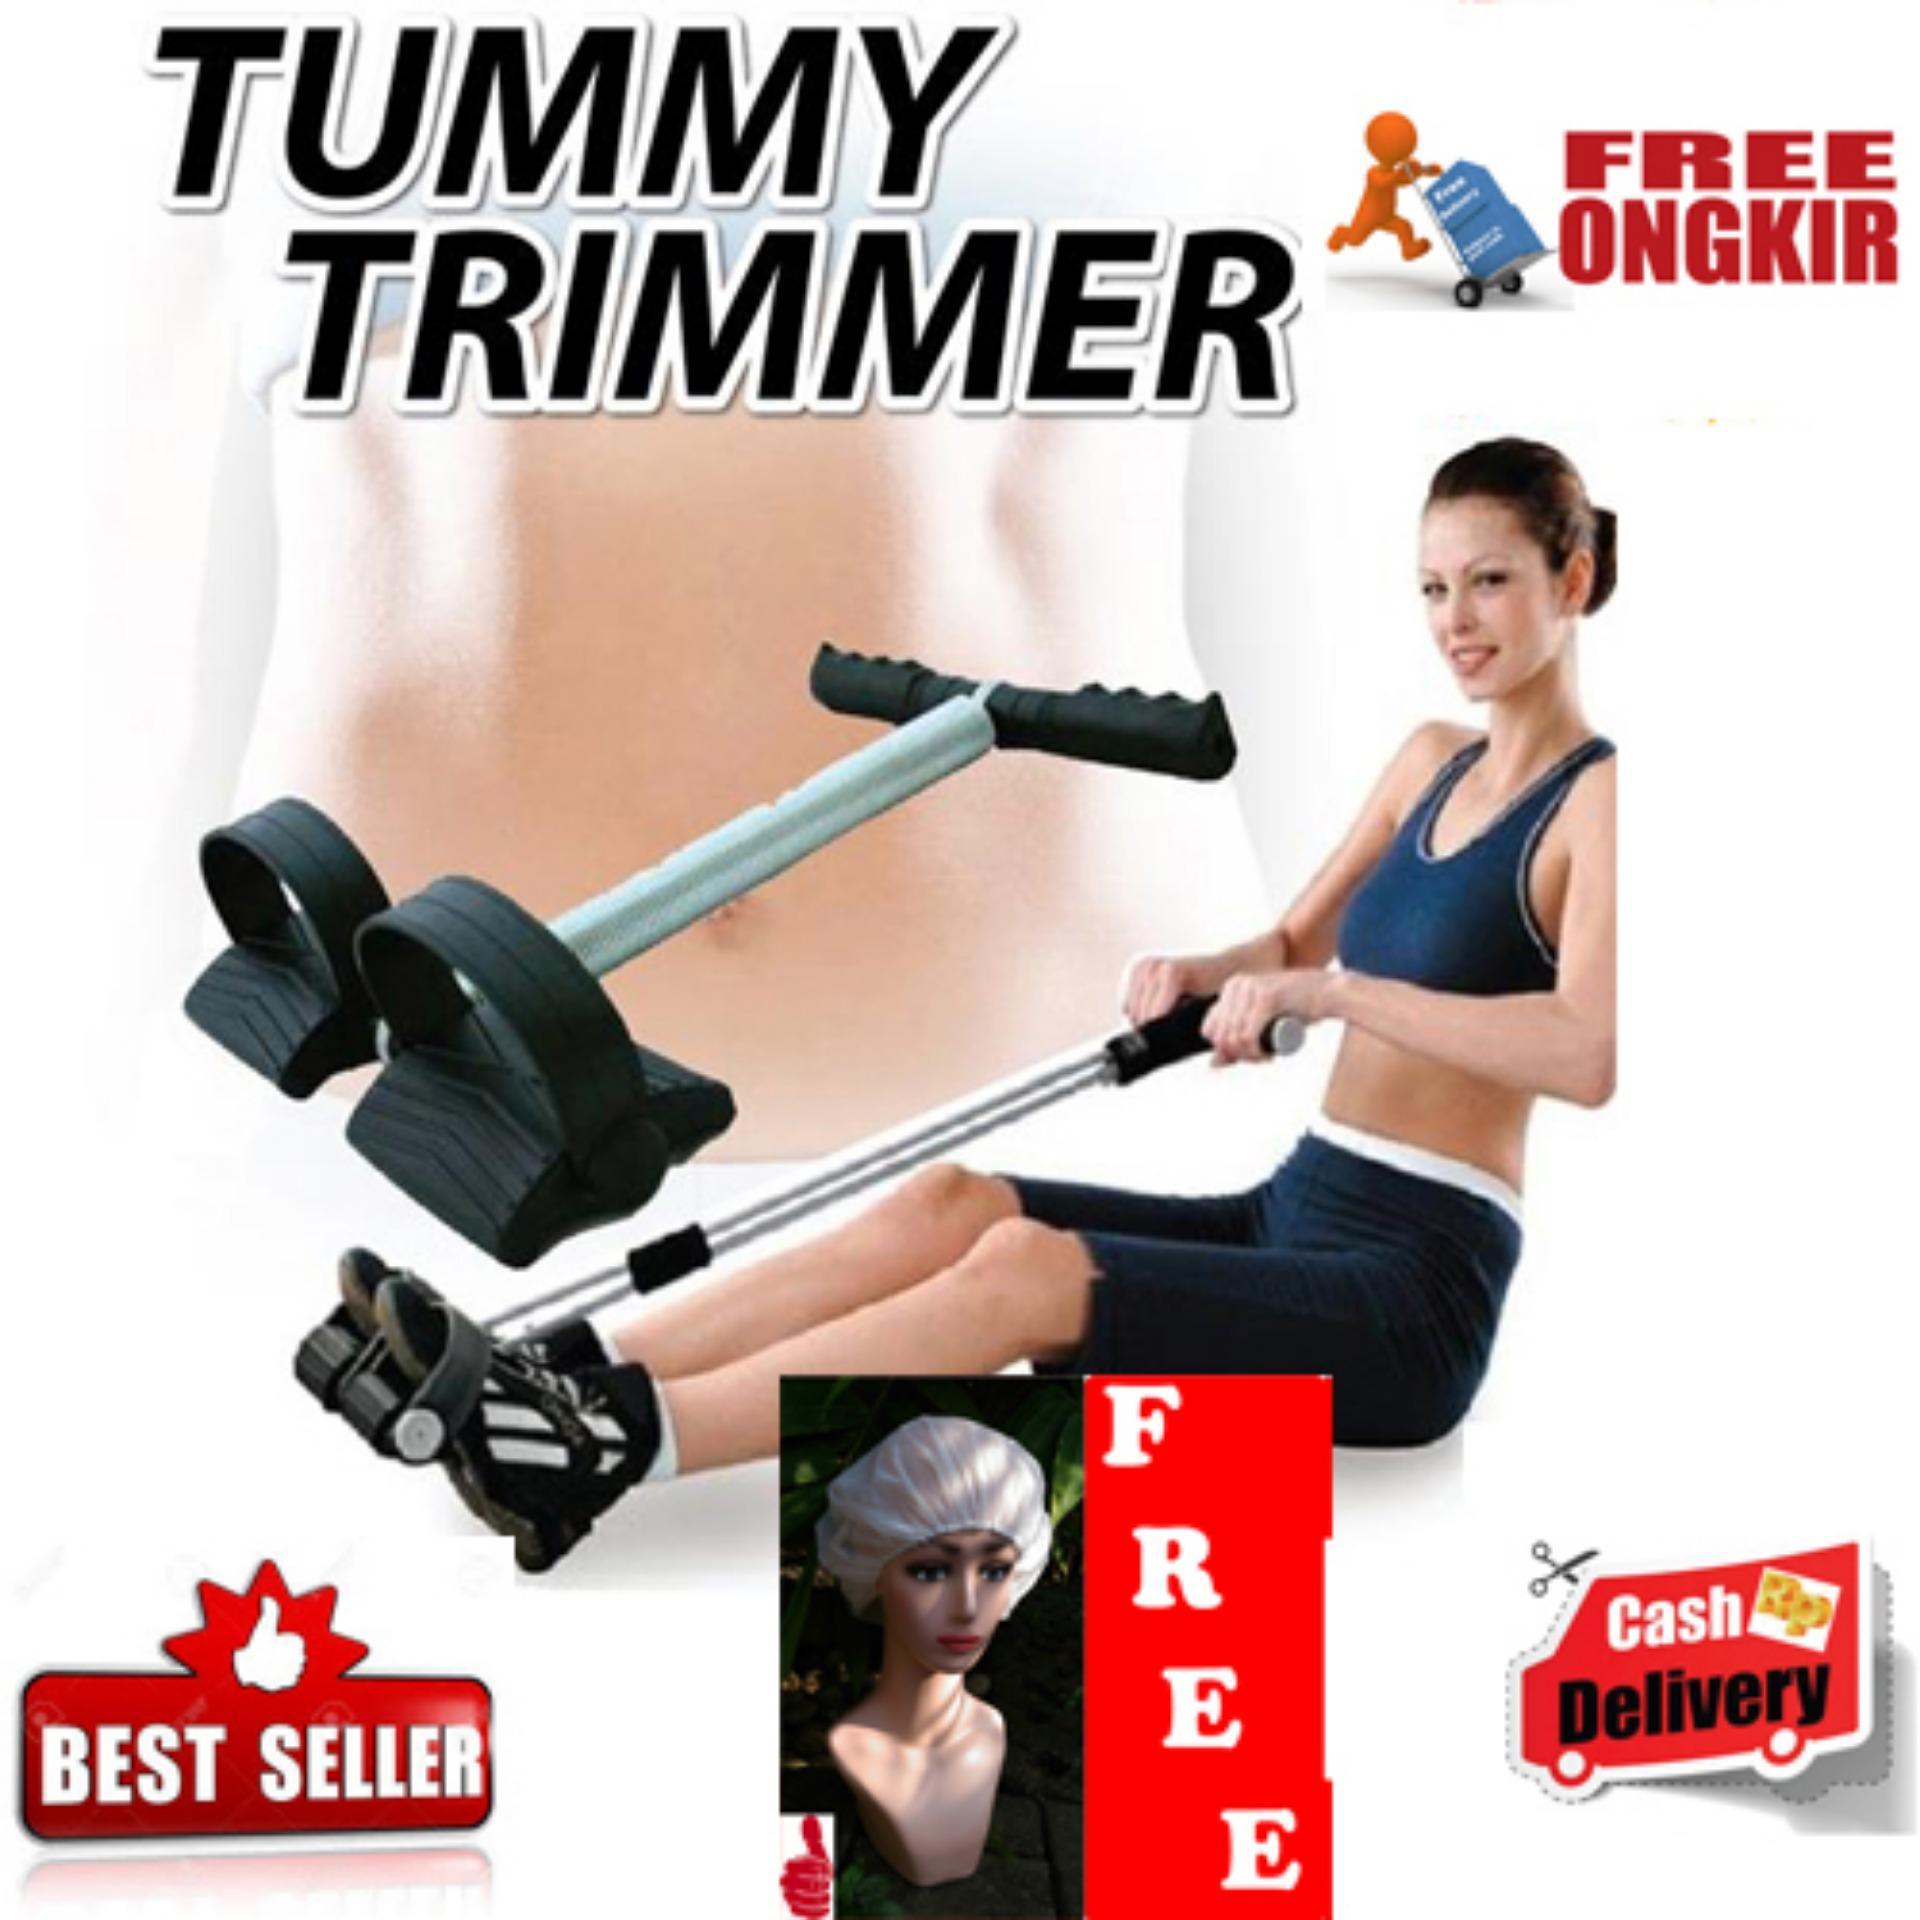 HOKI COD - QuincyLabel Tummy Trimmer Trimer Alat Olahraga Pembakar Lemak Perut - Pelangsing Perut -